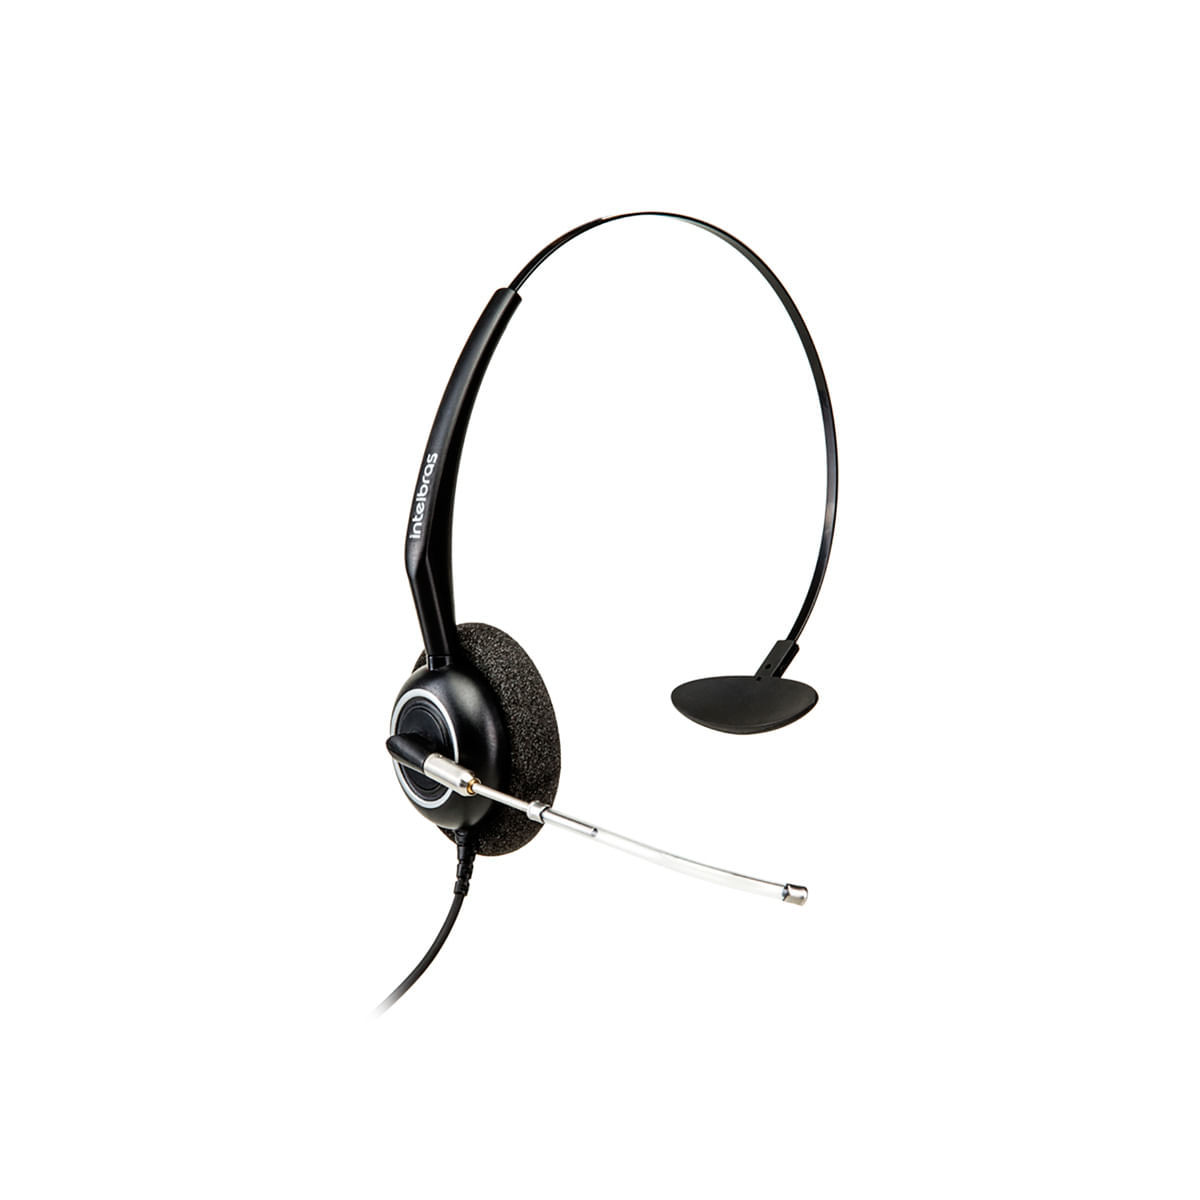 Headset USB Intelbras THS 55